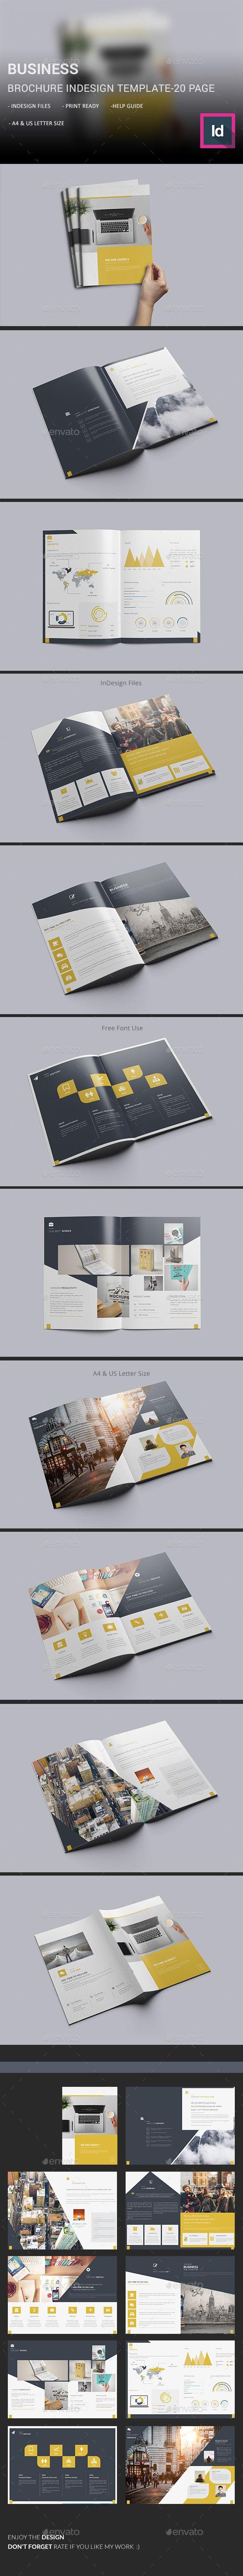 Business Brochure InDesign Template | Pinterest